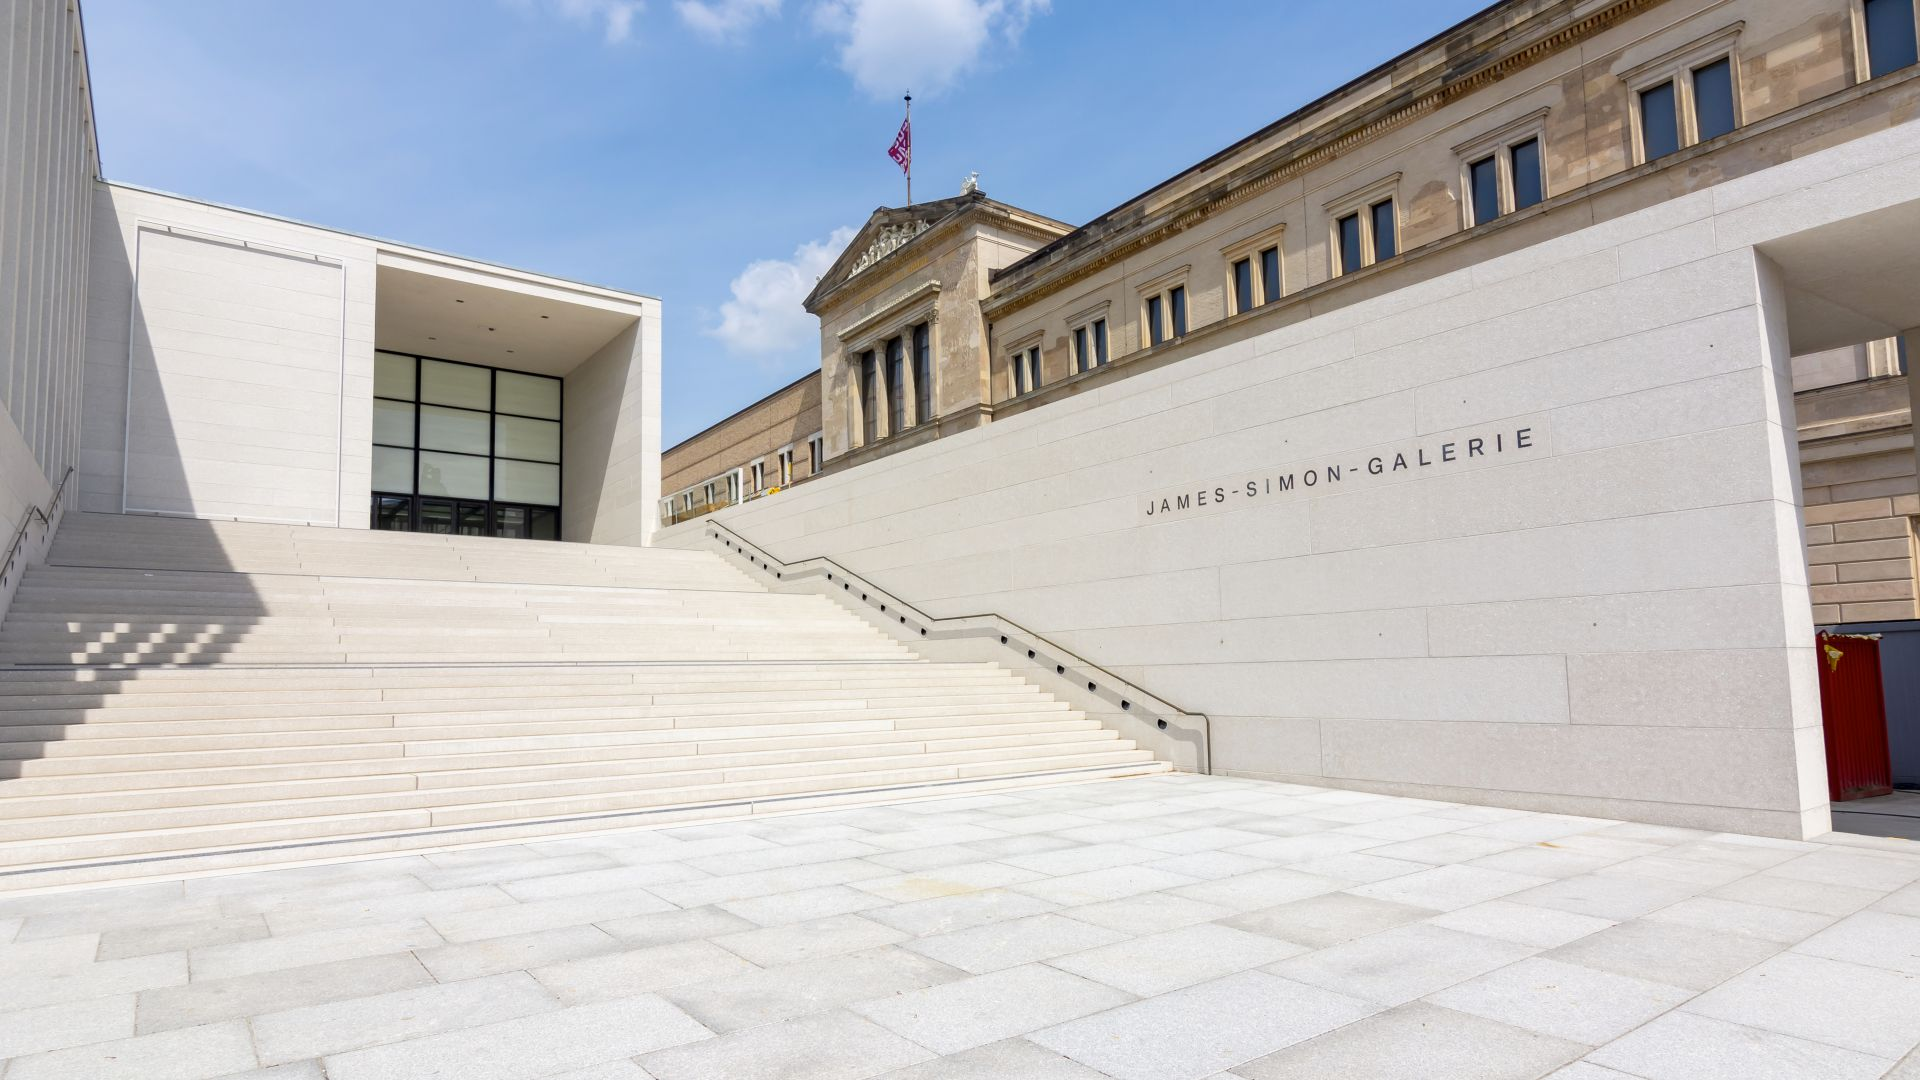 Berlin: James-Simon-Galerie auf der Museumsinsel